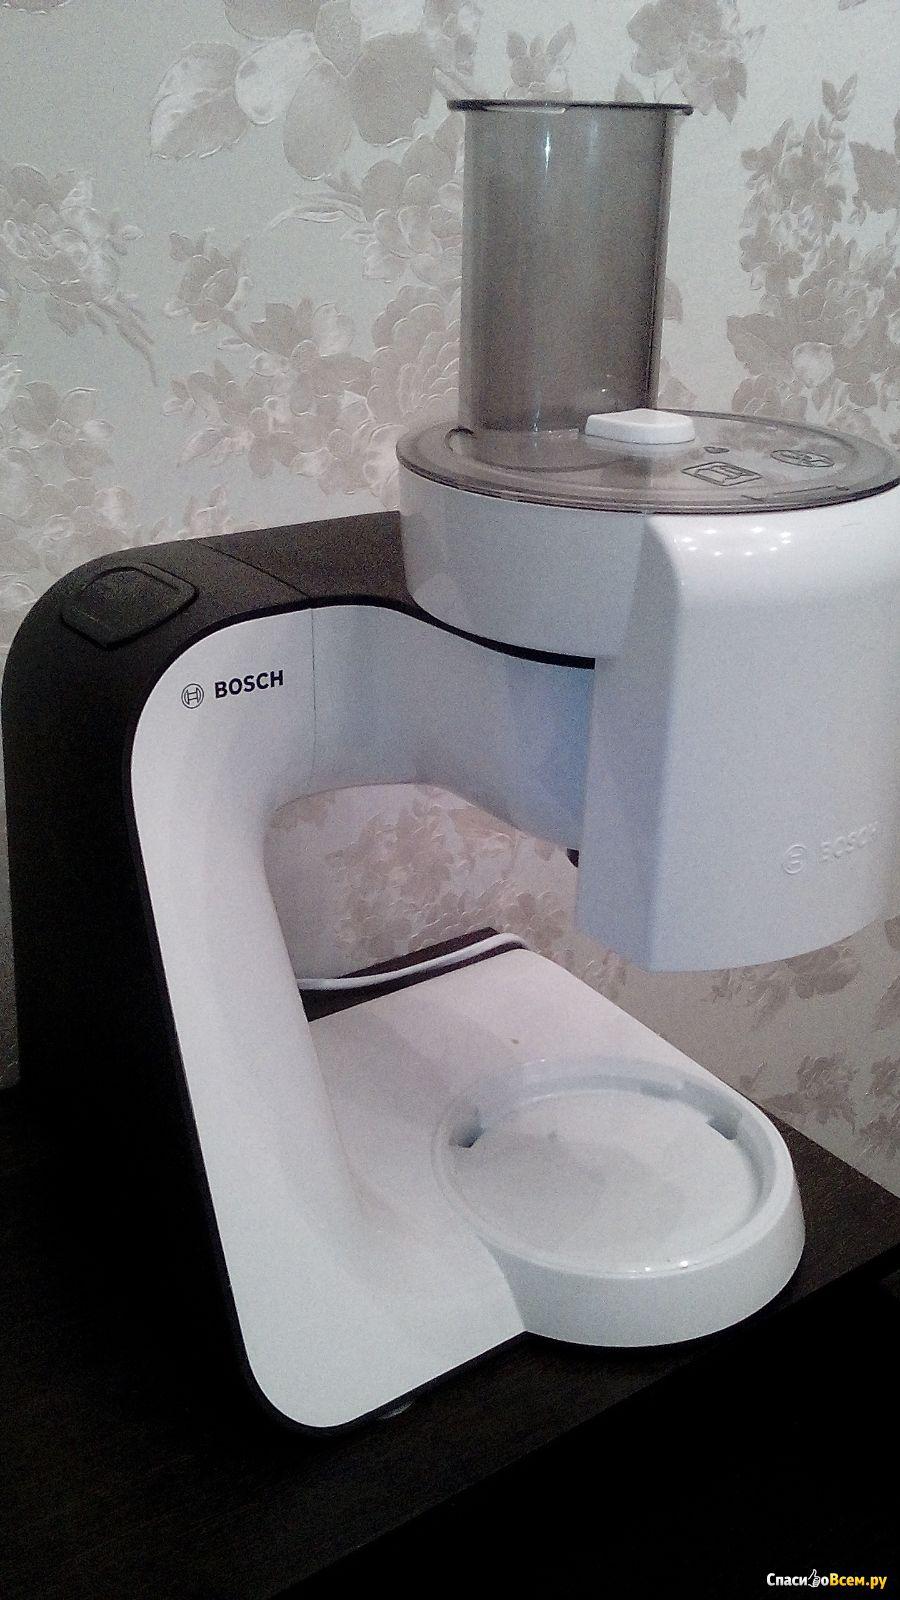 кухонный комбайн бош мсм 5380 инструкция